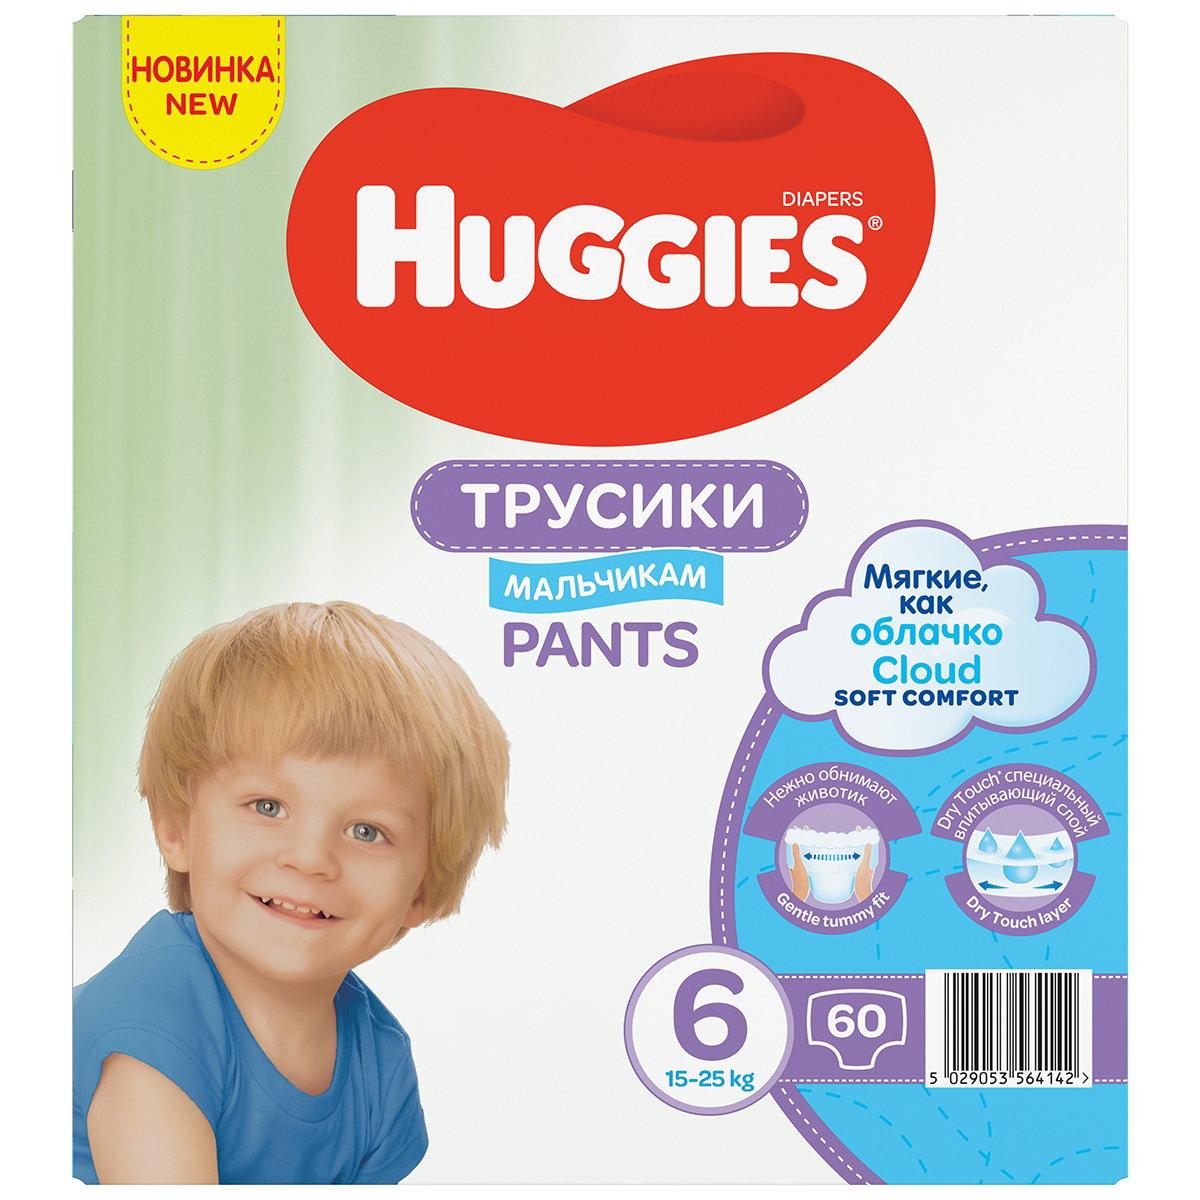 Scutece Huggies Pants Box Boys, Nr 6, 15 - 25 Kg, 60 Buc